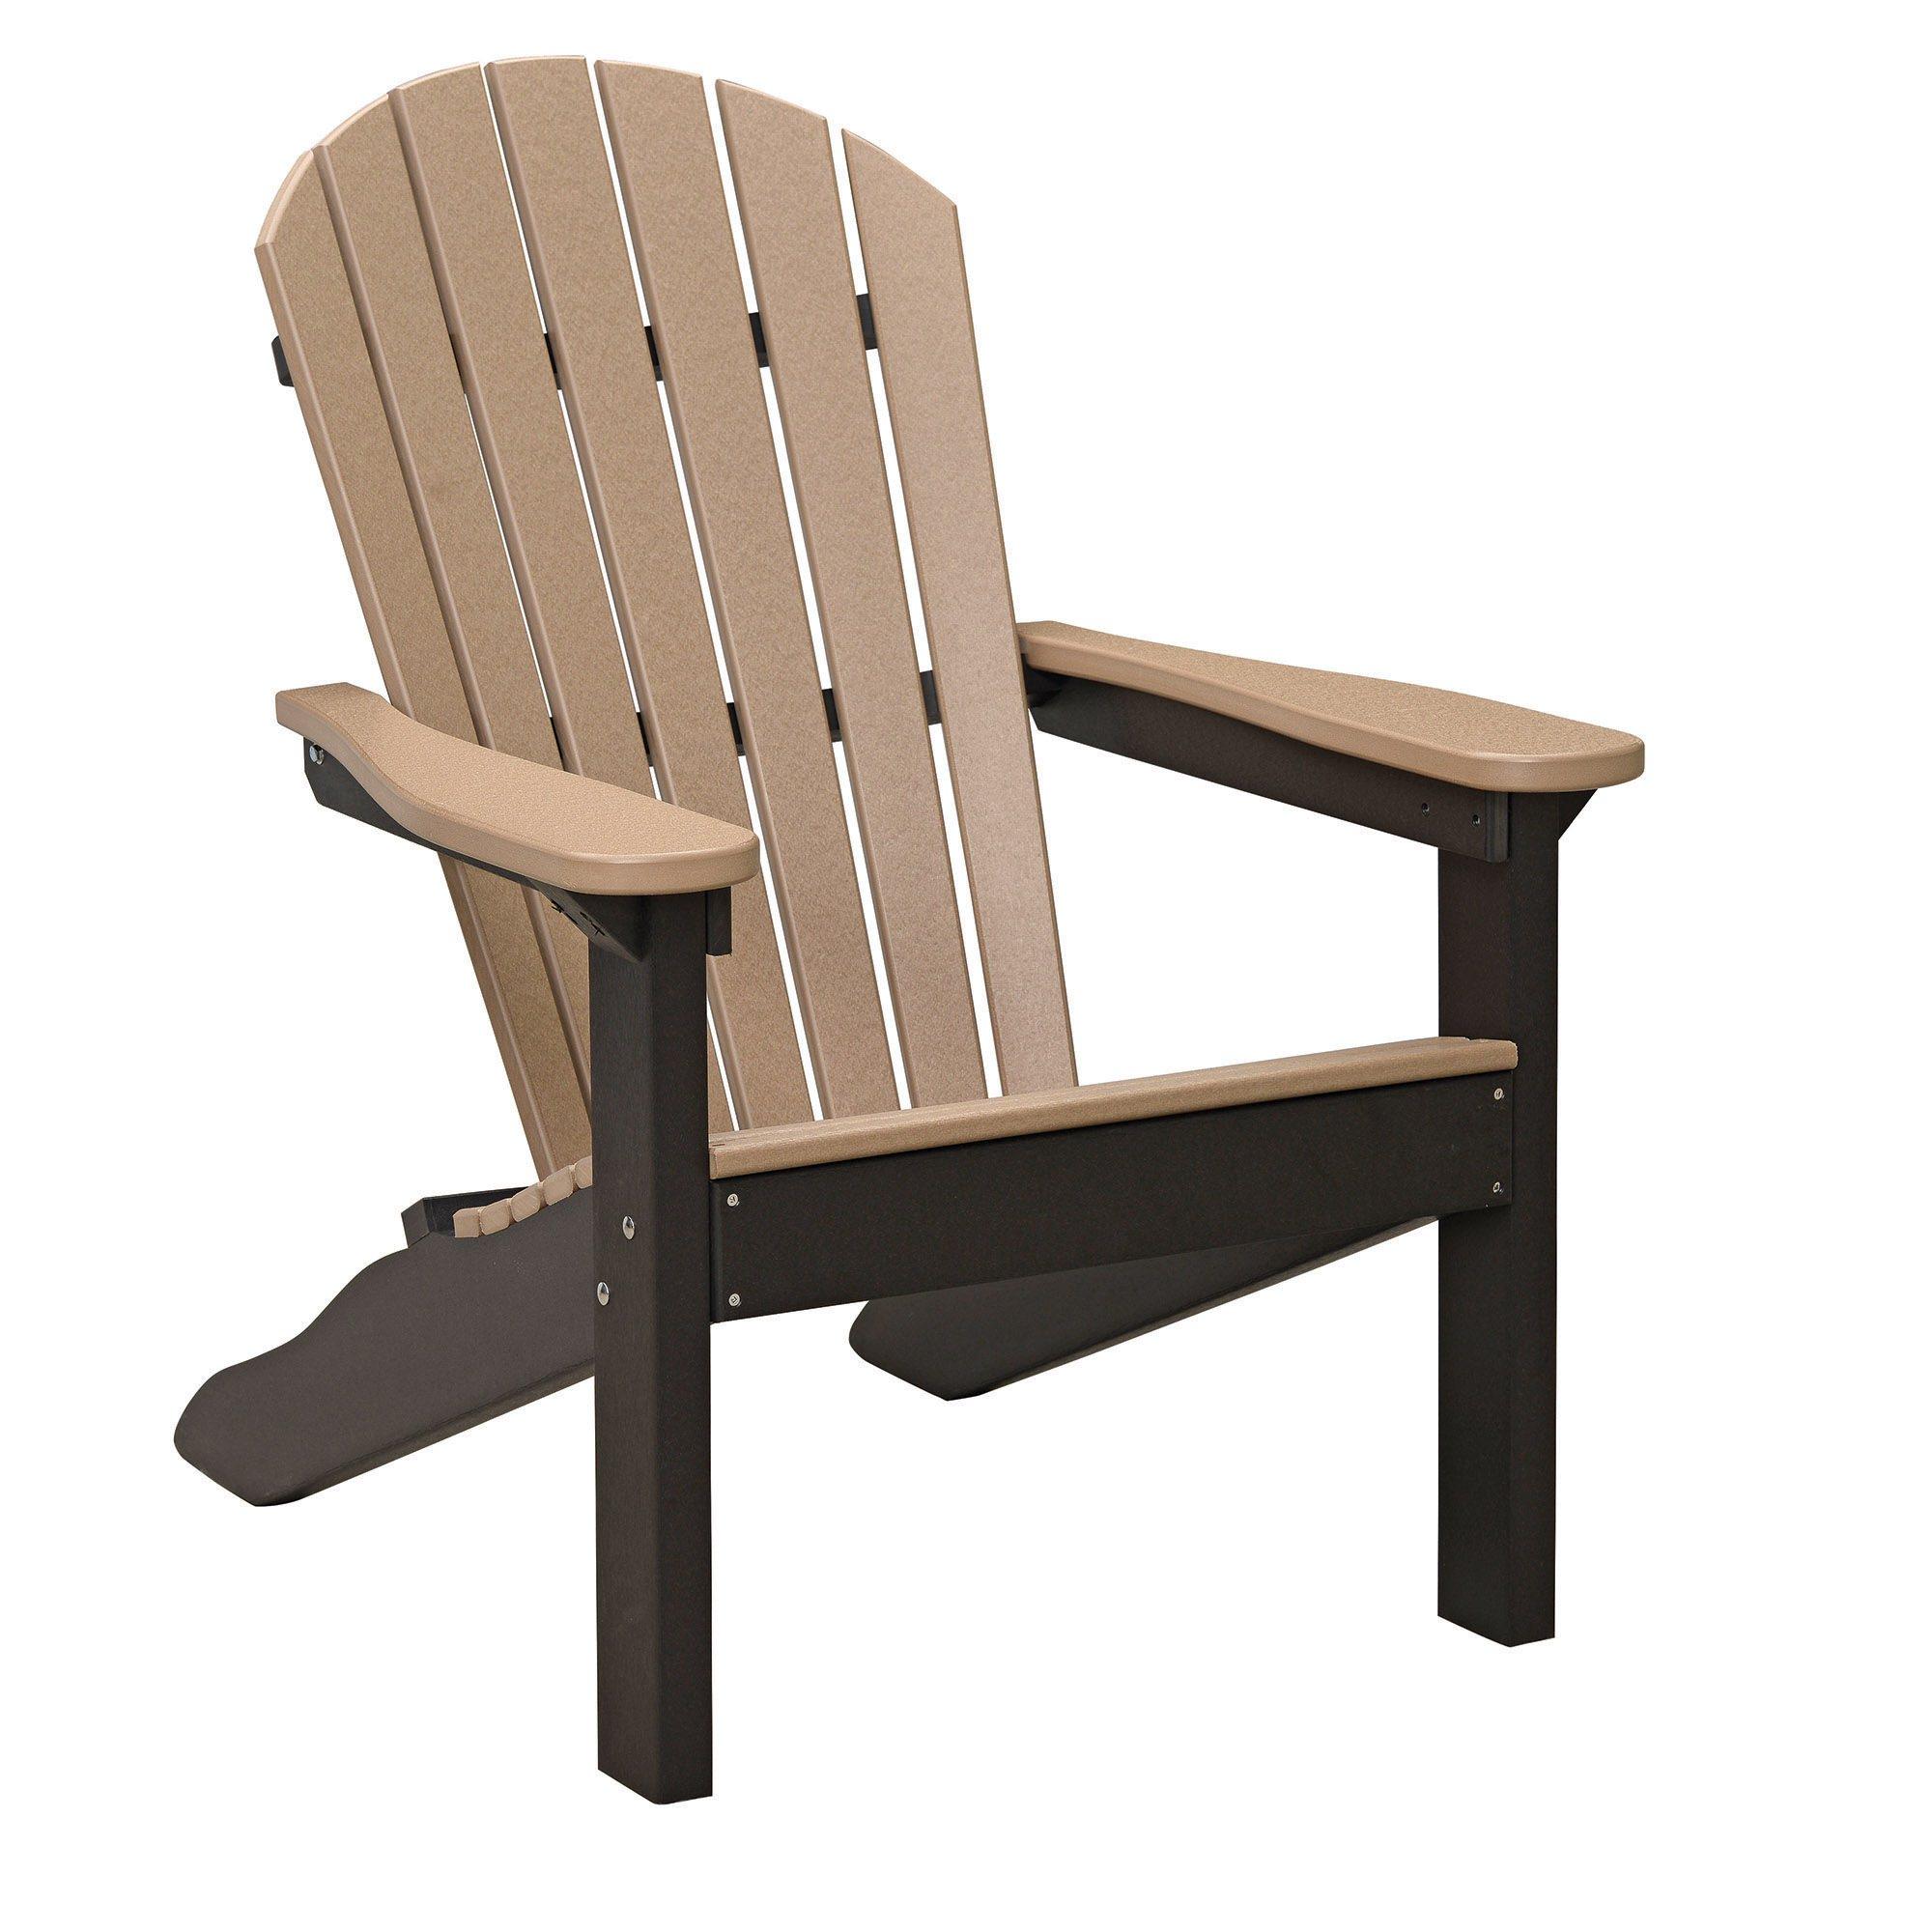 Brown Resin Adirondack Chairs